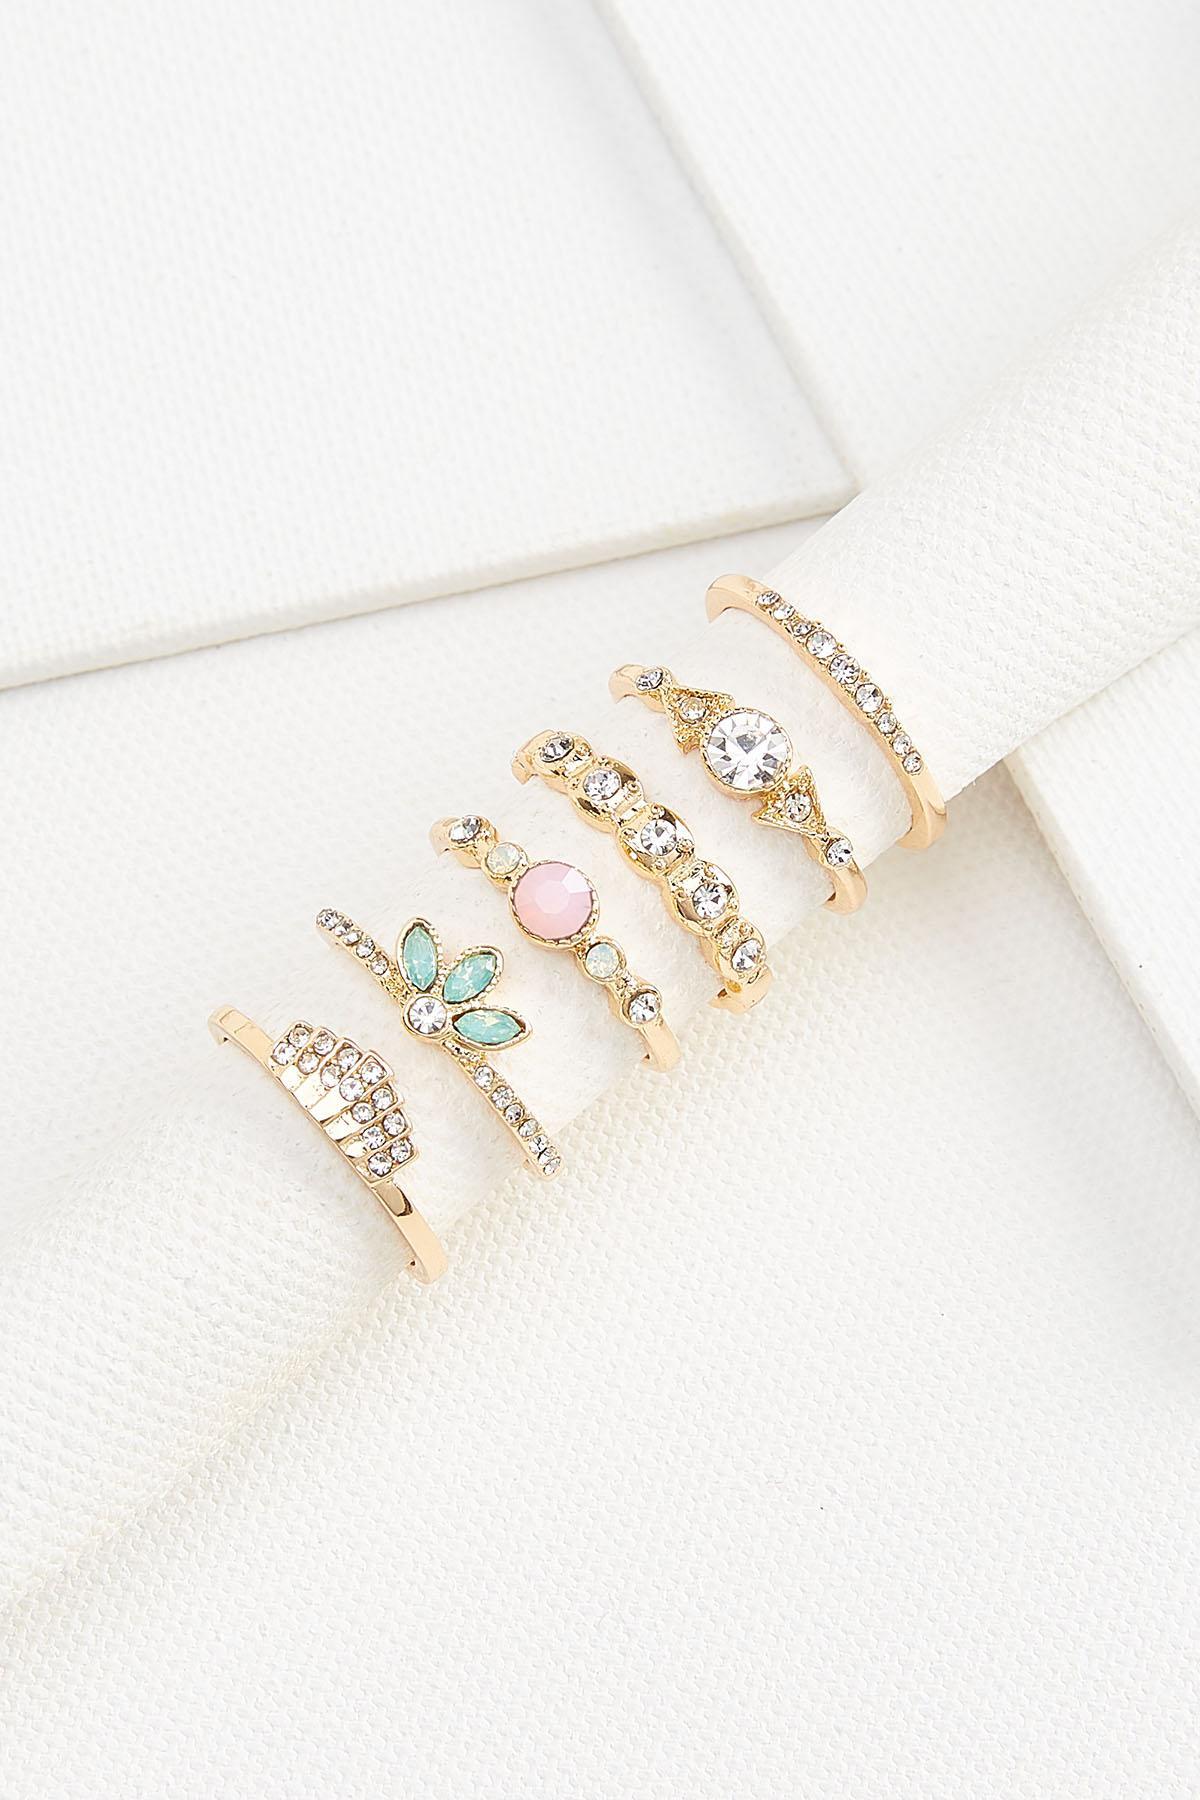 Stacked Stone Ring Set